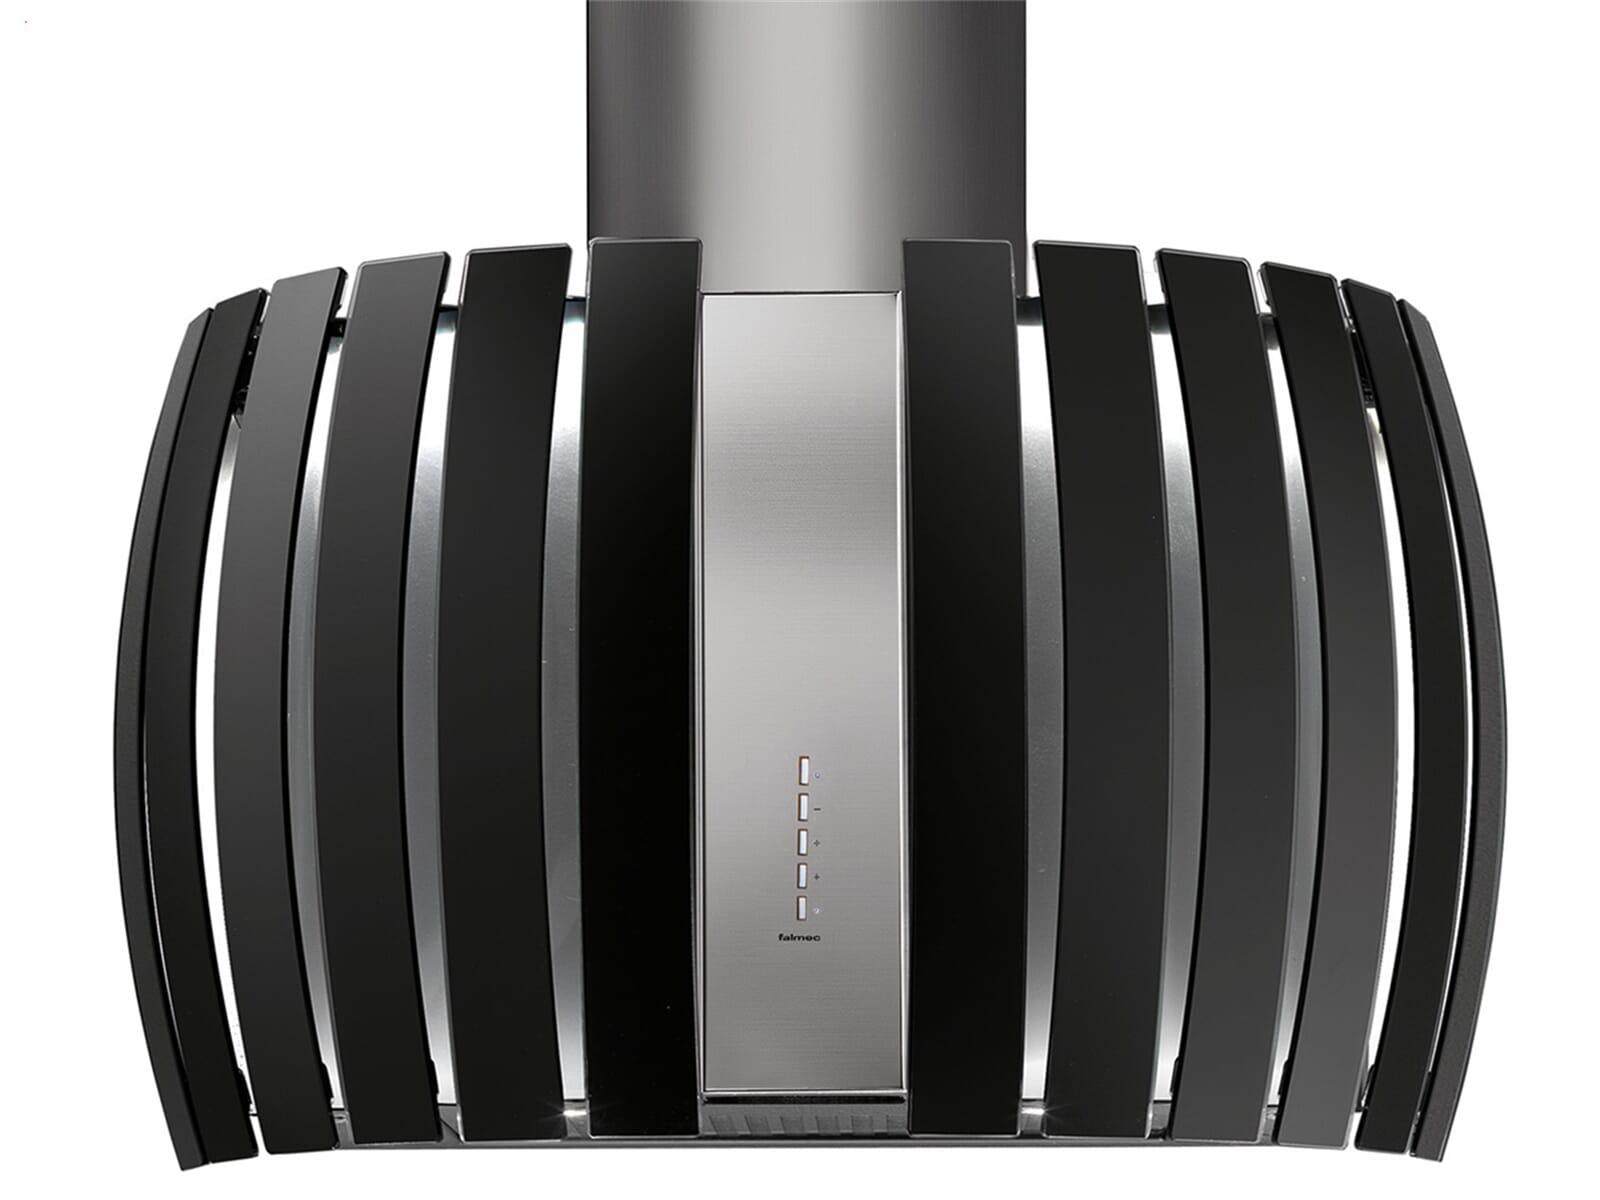 dunstabzugshaube mit led beleuchtung preisvergleiche. Black Bedroom Furniture Sets. Home Design Ideas